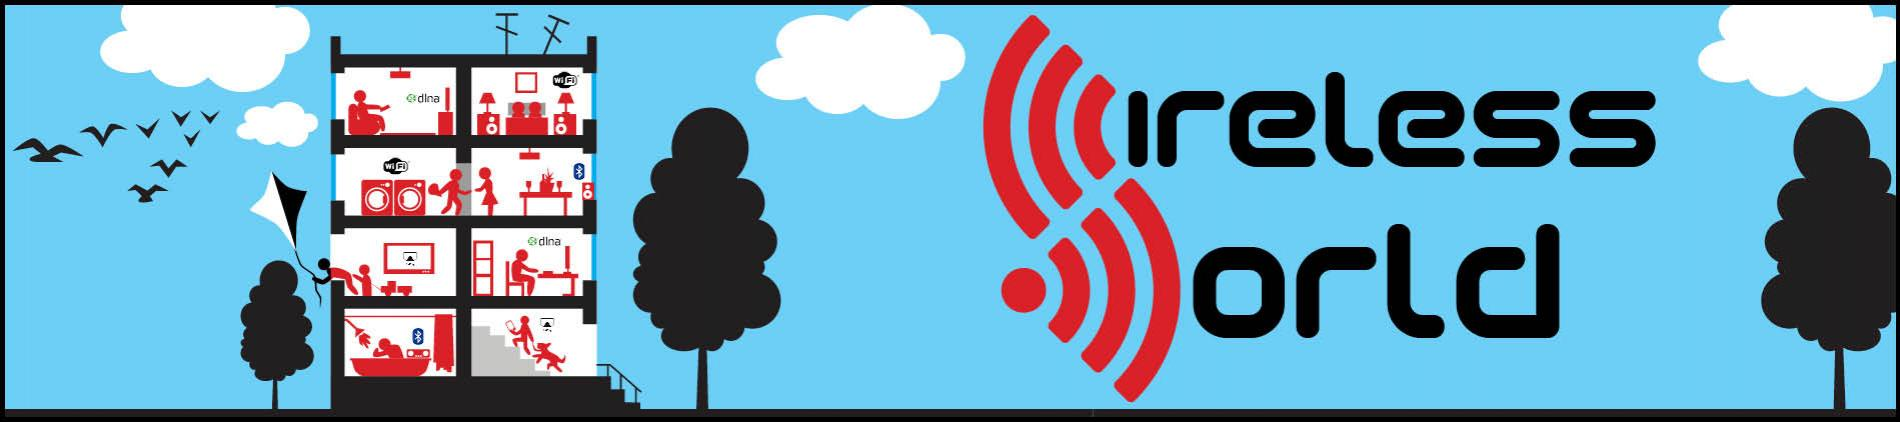 wireless, world, flyer, avu